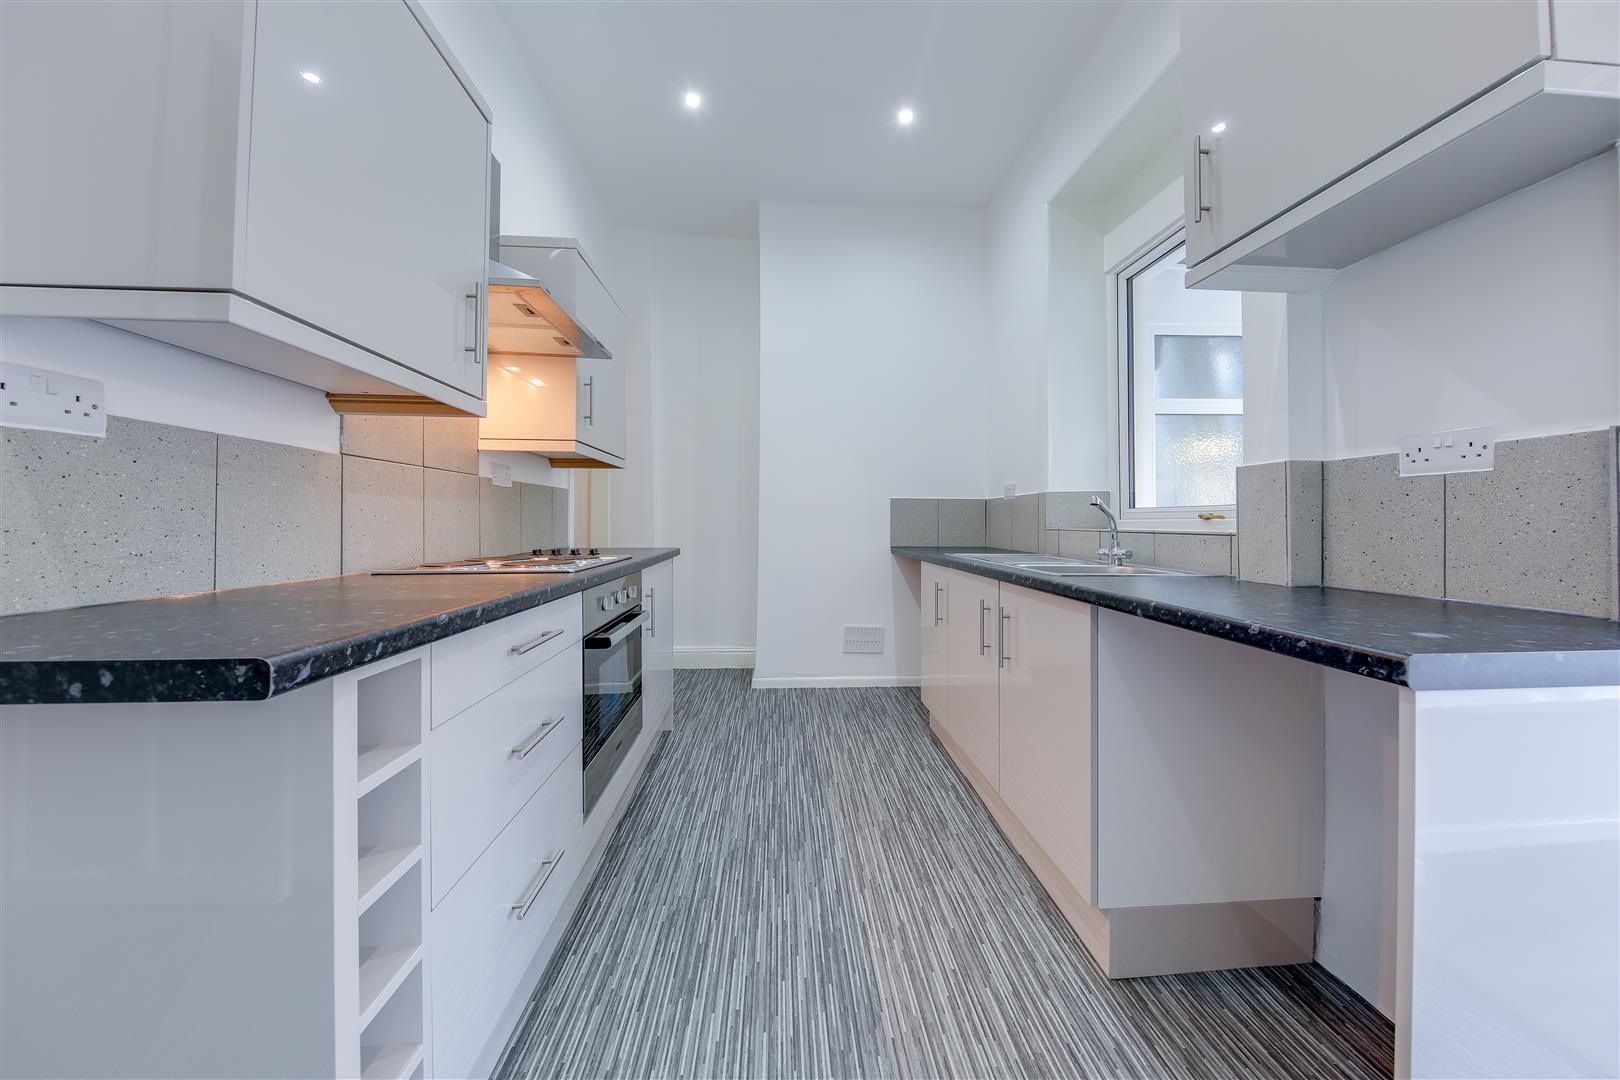 3 bedroom house for sale adelaide street rossendale lancashire